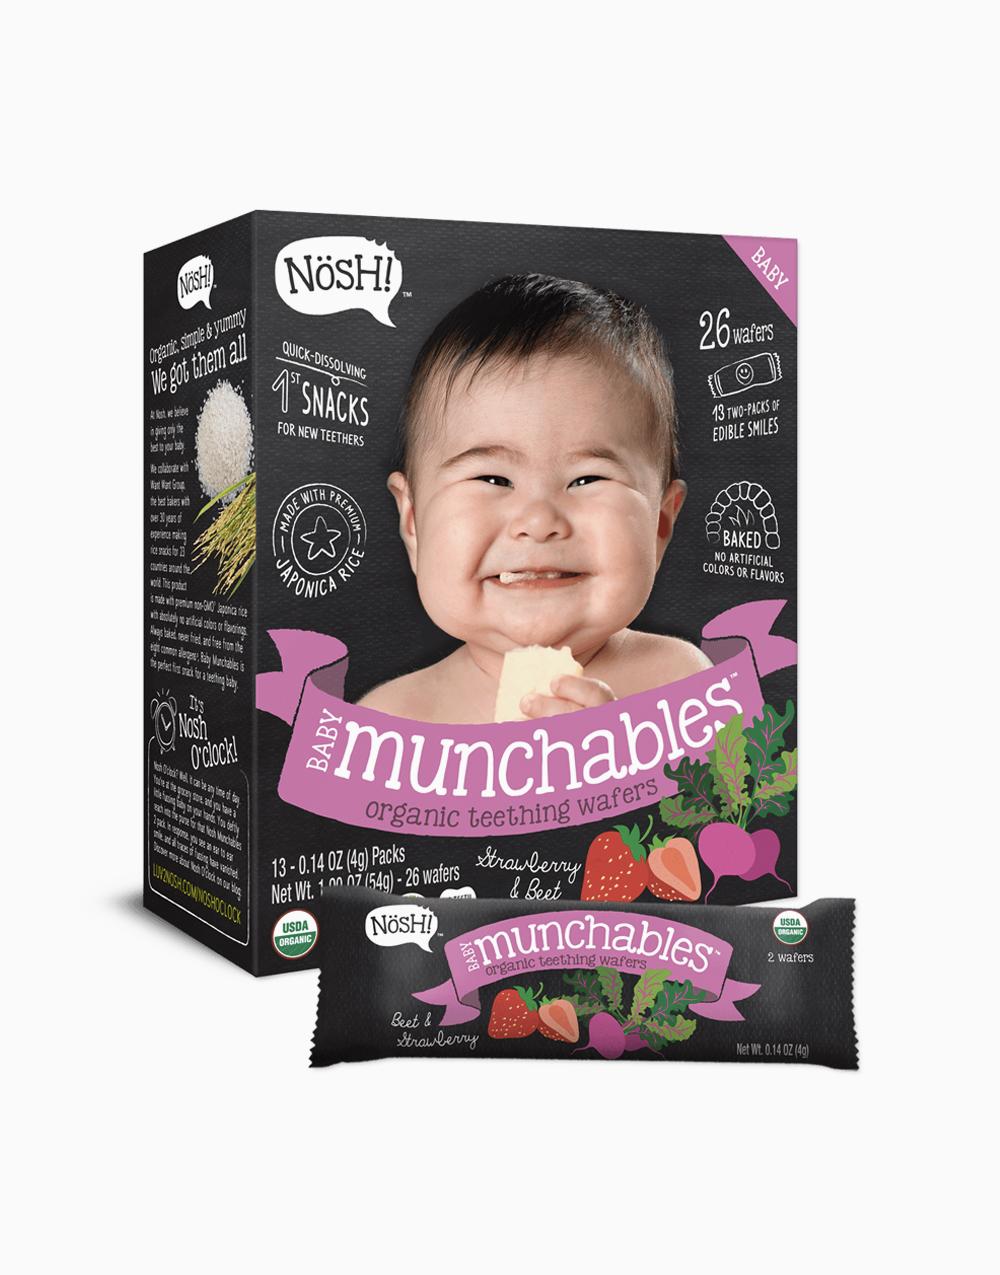 Strawberry Beet Organic Vegan Baby Munchables  by Nosh!